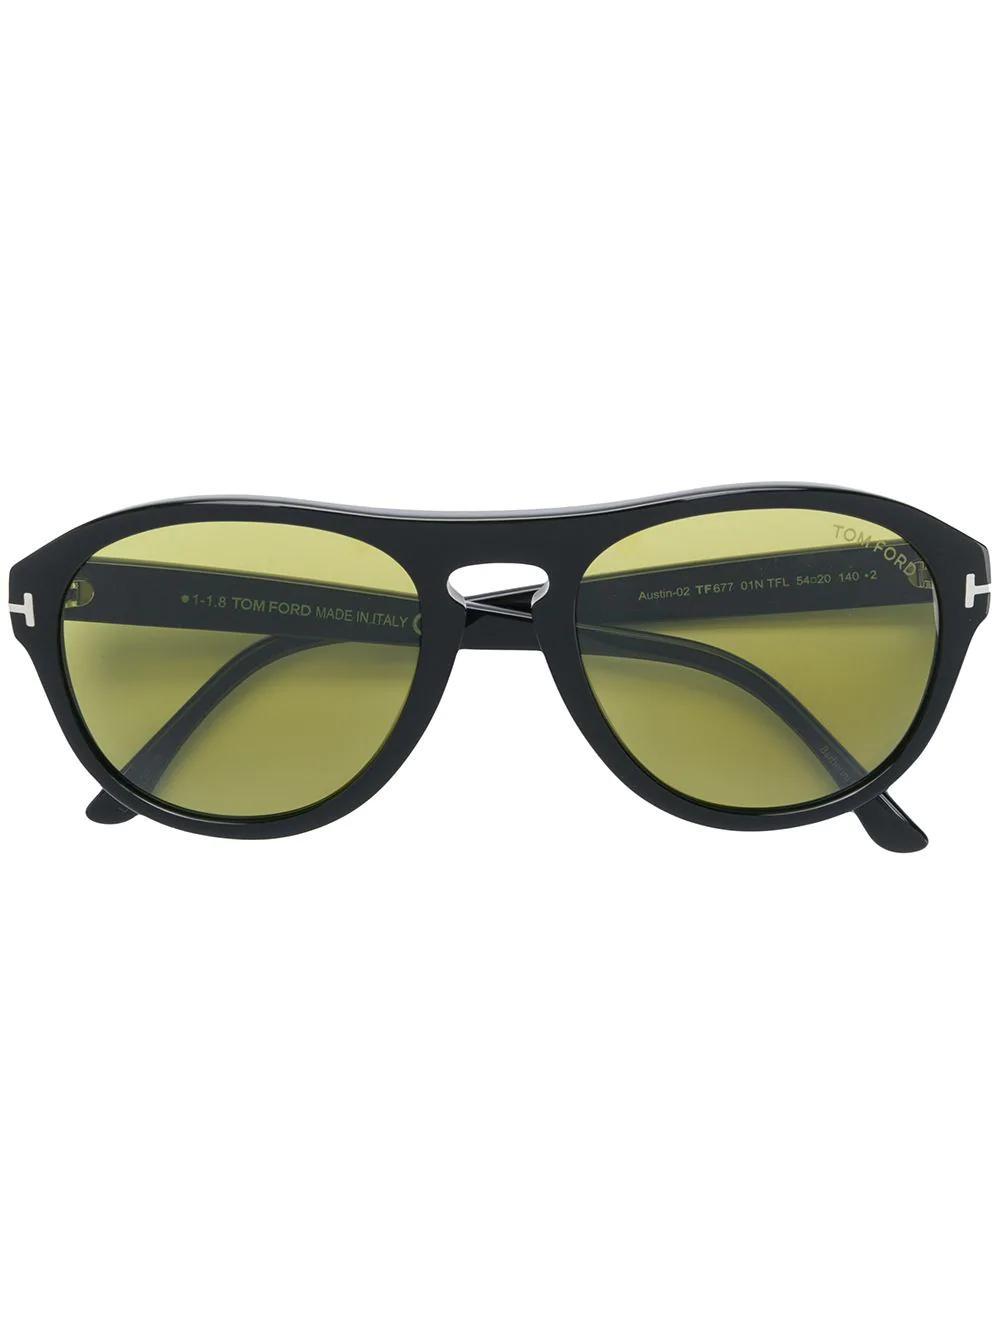 8502d67ebf81 Tom Ford Eyewear Austin Sunglasses - Black | ModeSens